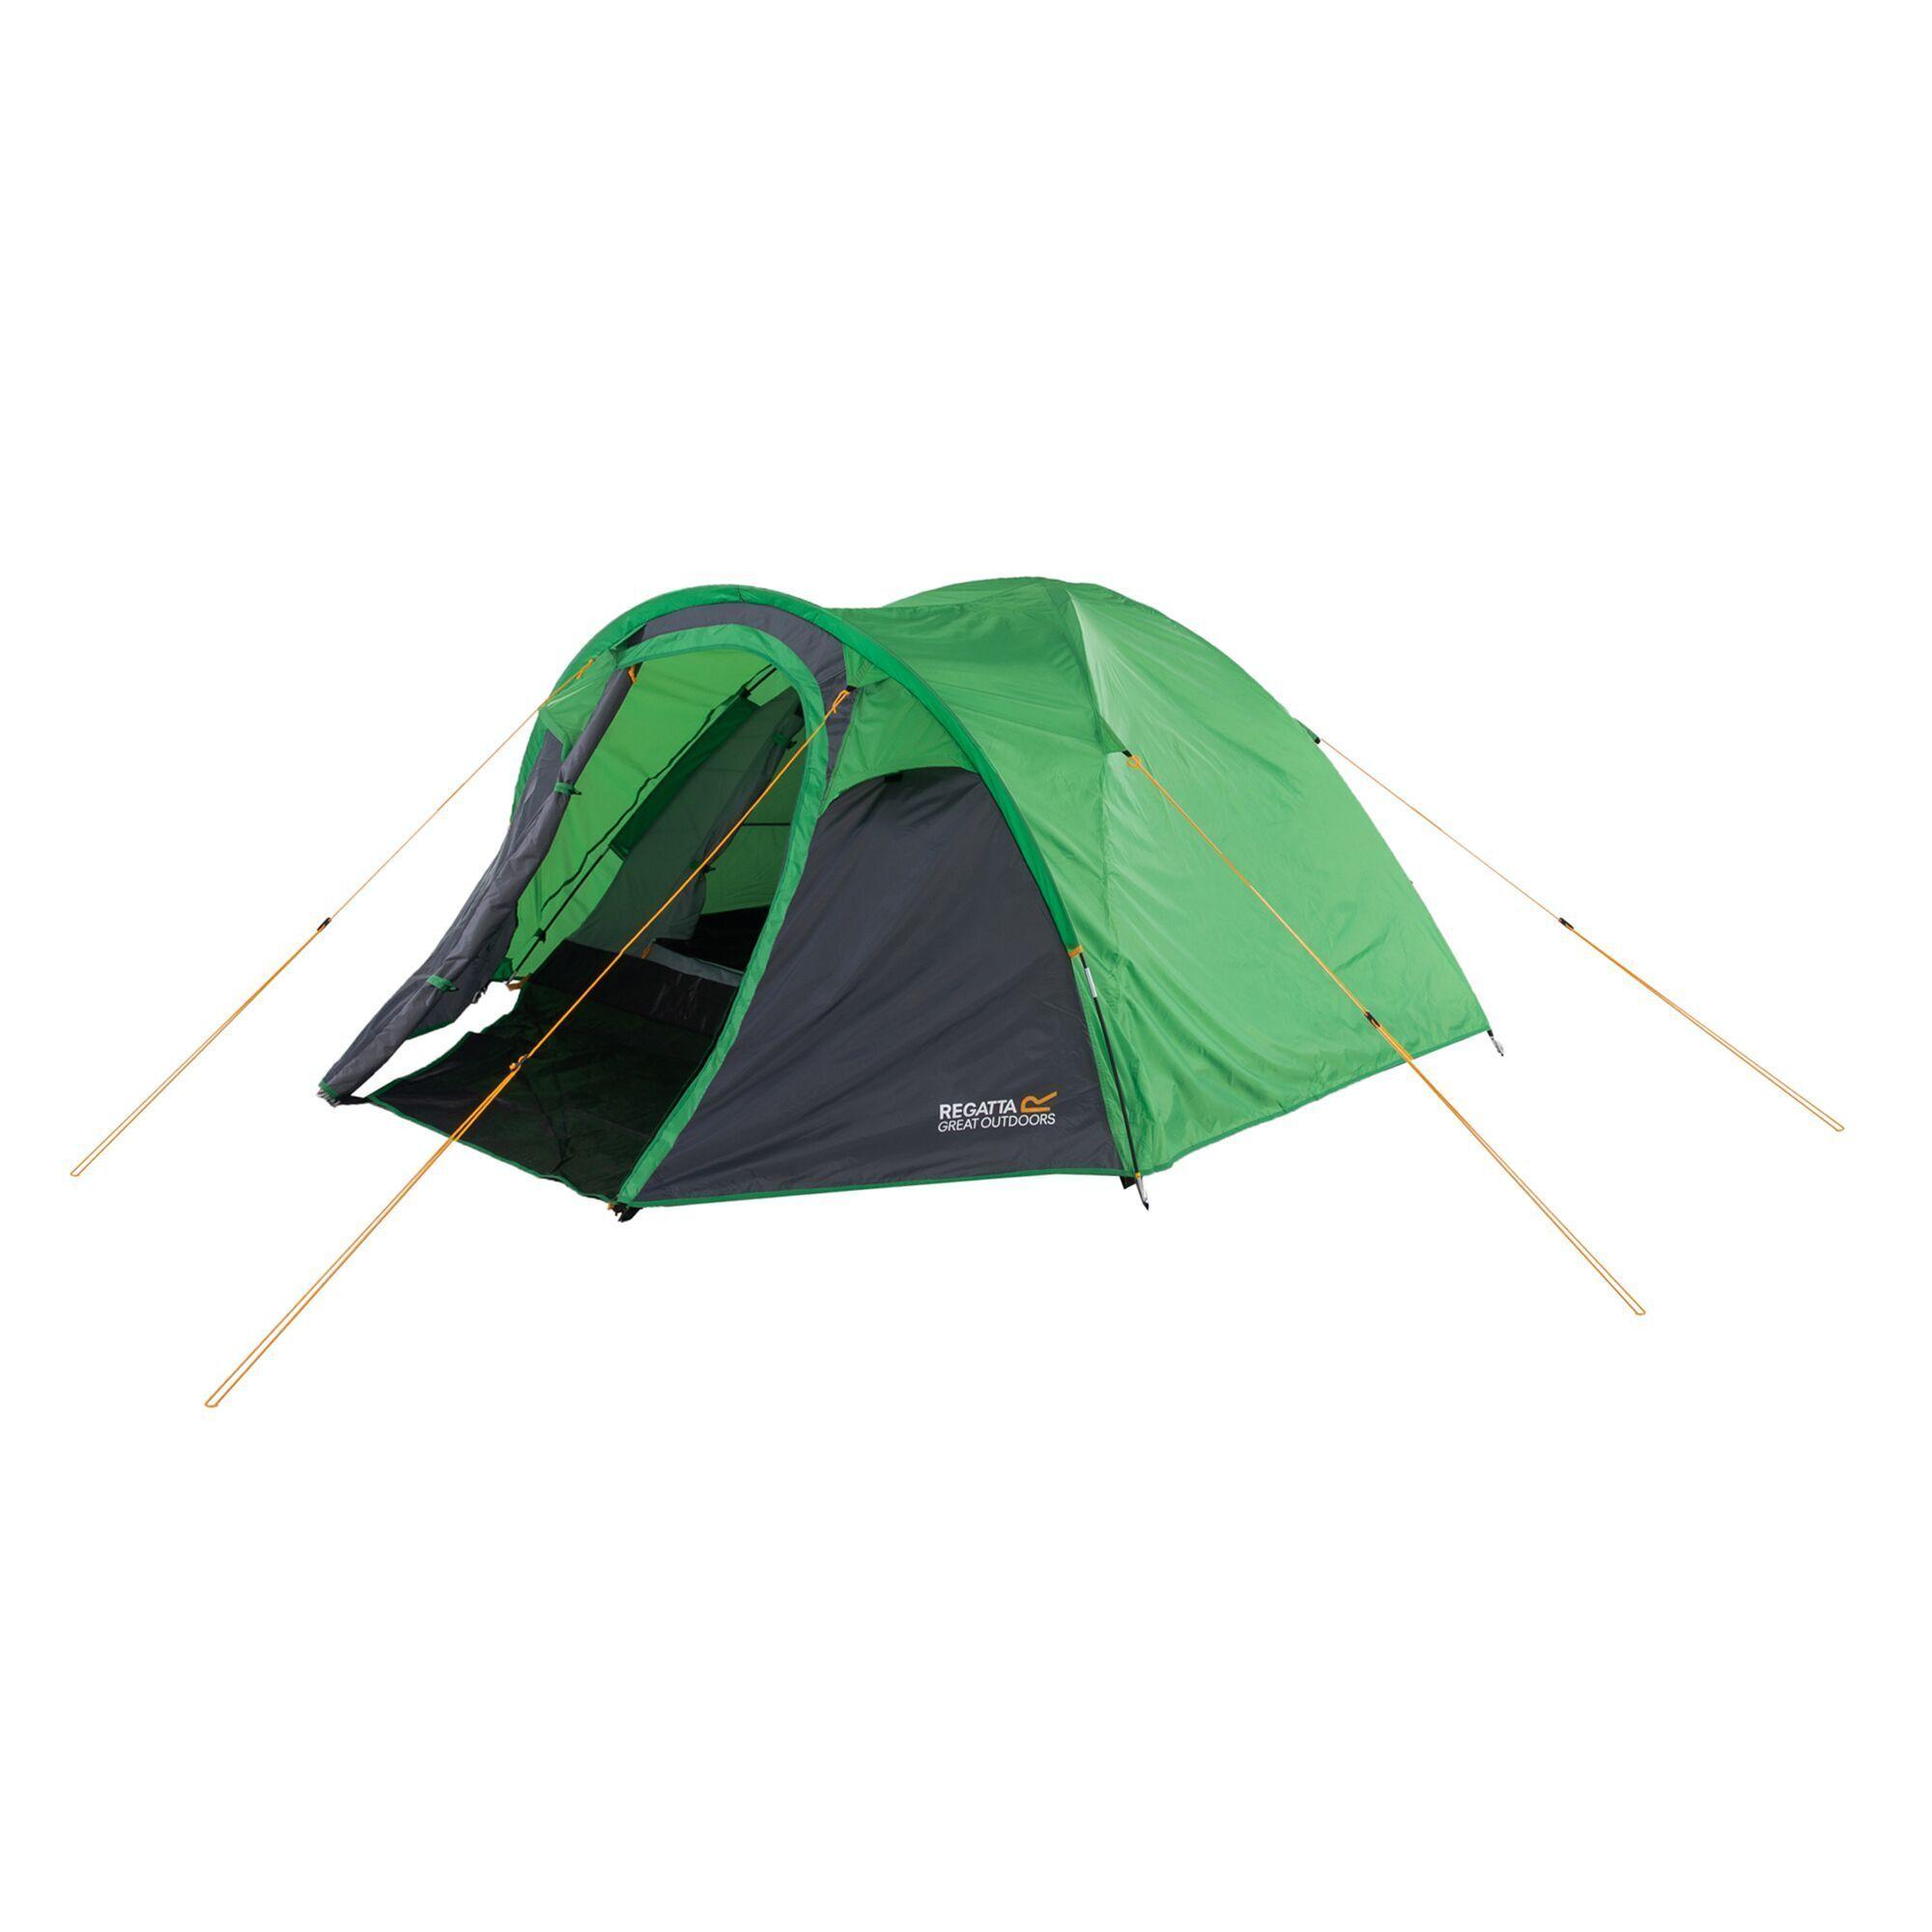 Kivu 3 Man Dome Tent Extreme Green Seal Grey